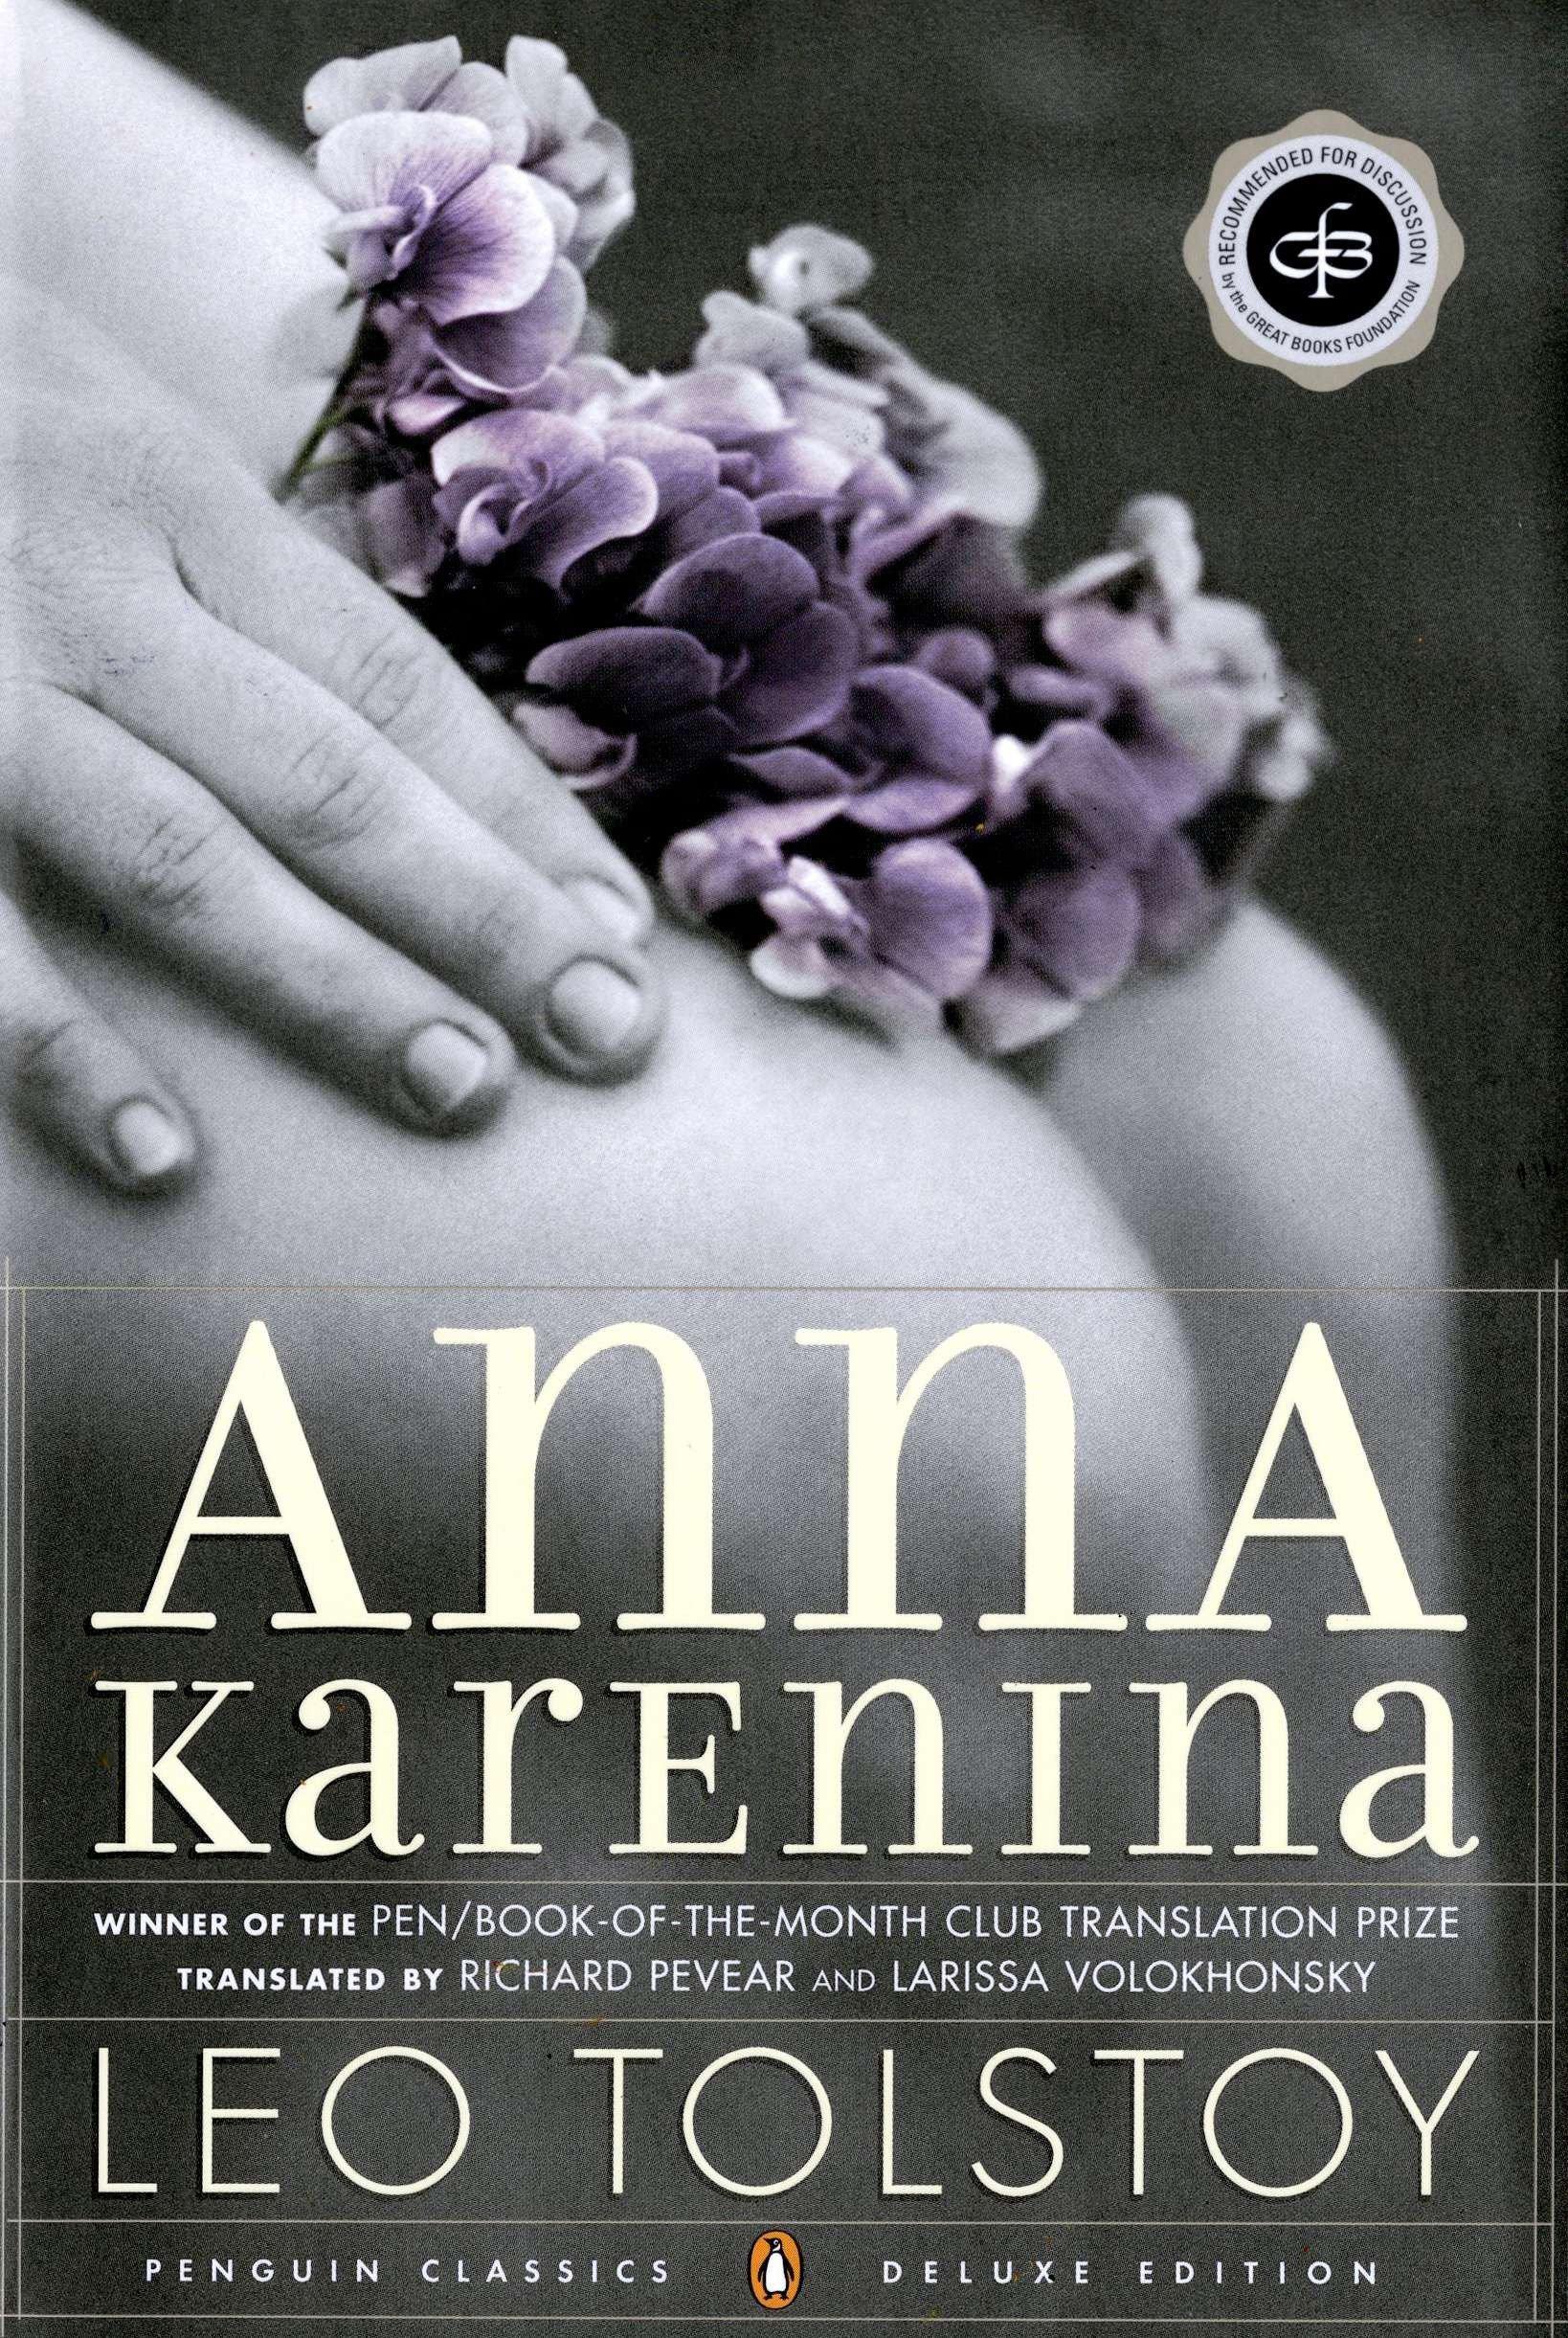 Amazon.com: Anna Karenina (8601400171455): Tolstoy, Leo, Pevear, Richard,  Volokhonsky, Larissa: Books